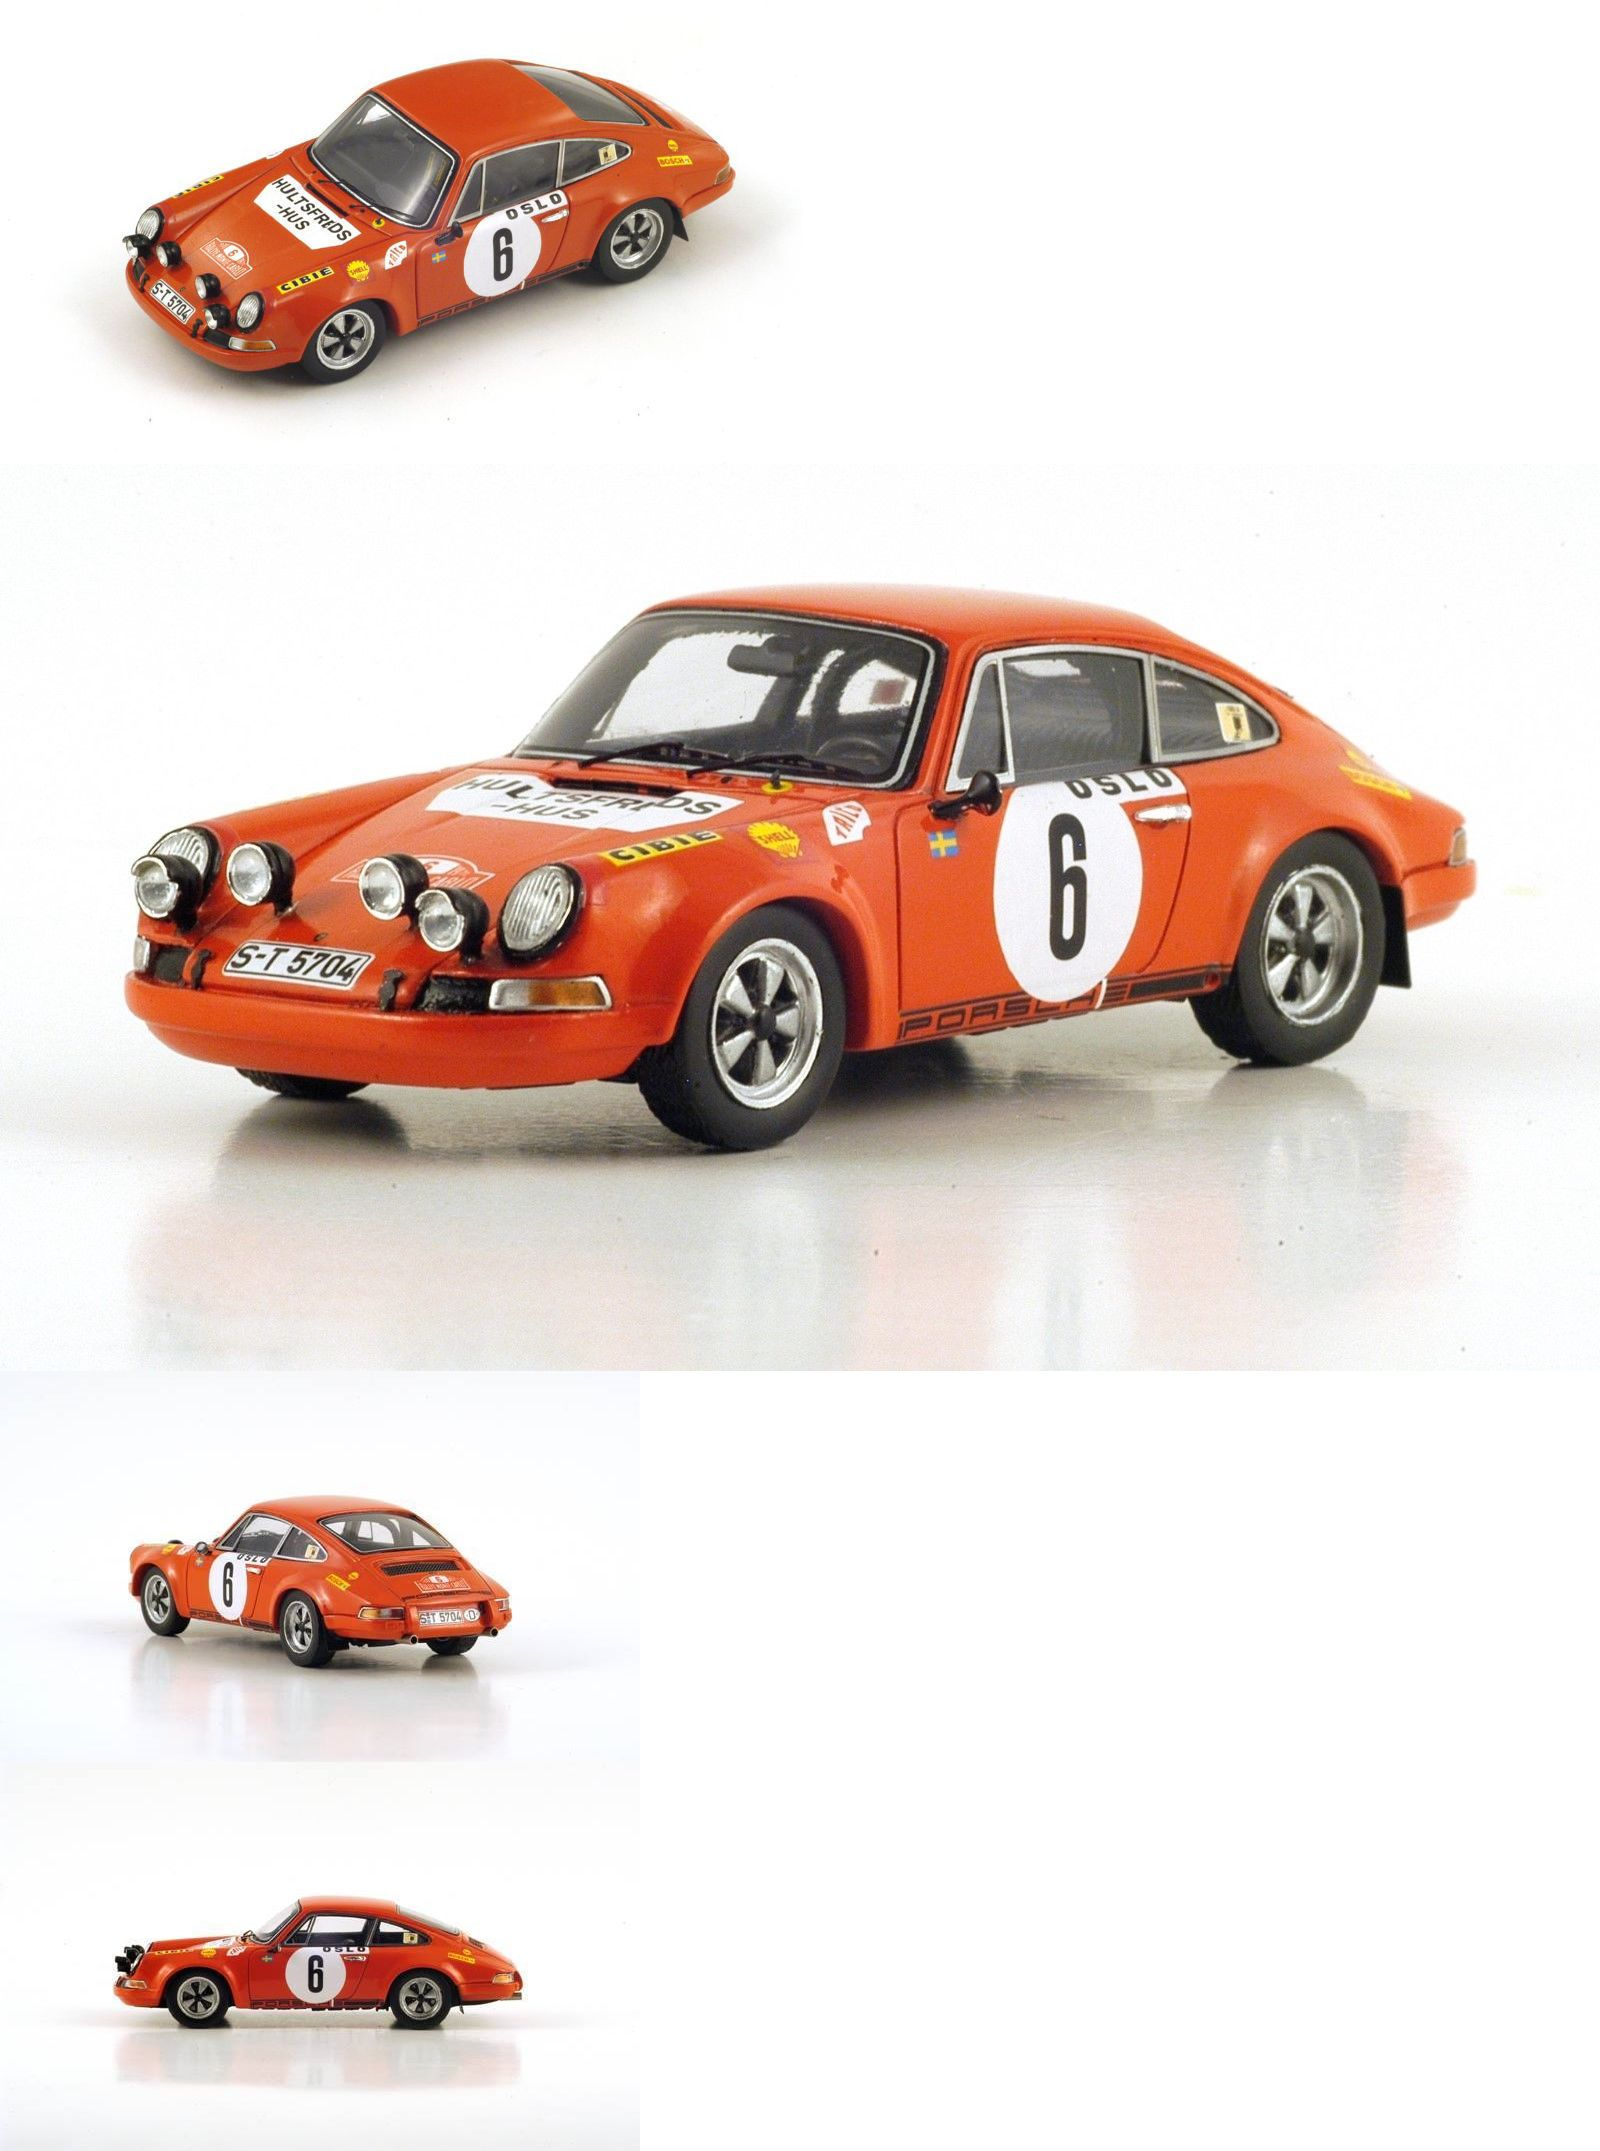 Rally Cars S4023 Spark 1 43 Porsche 911S 6 Winner